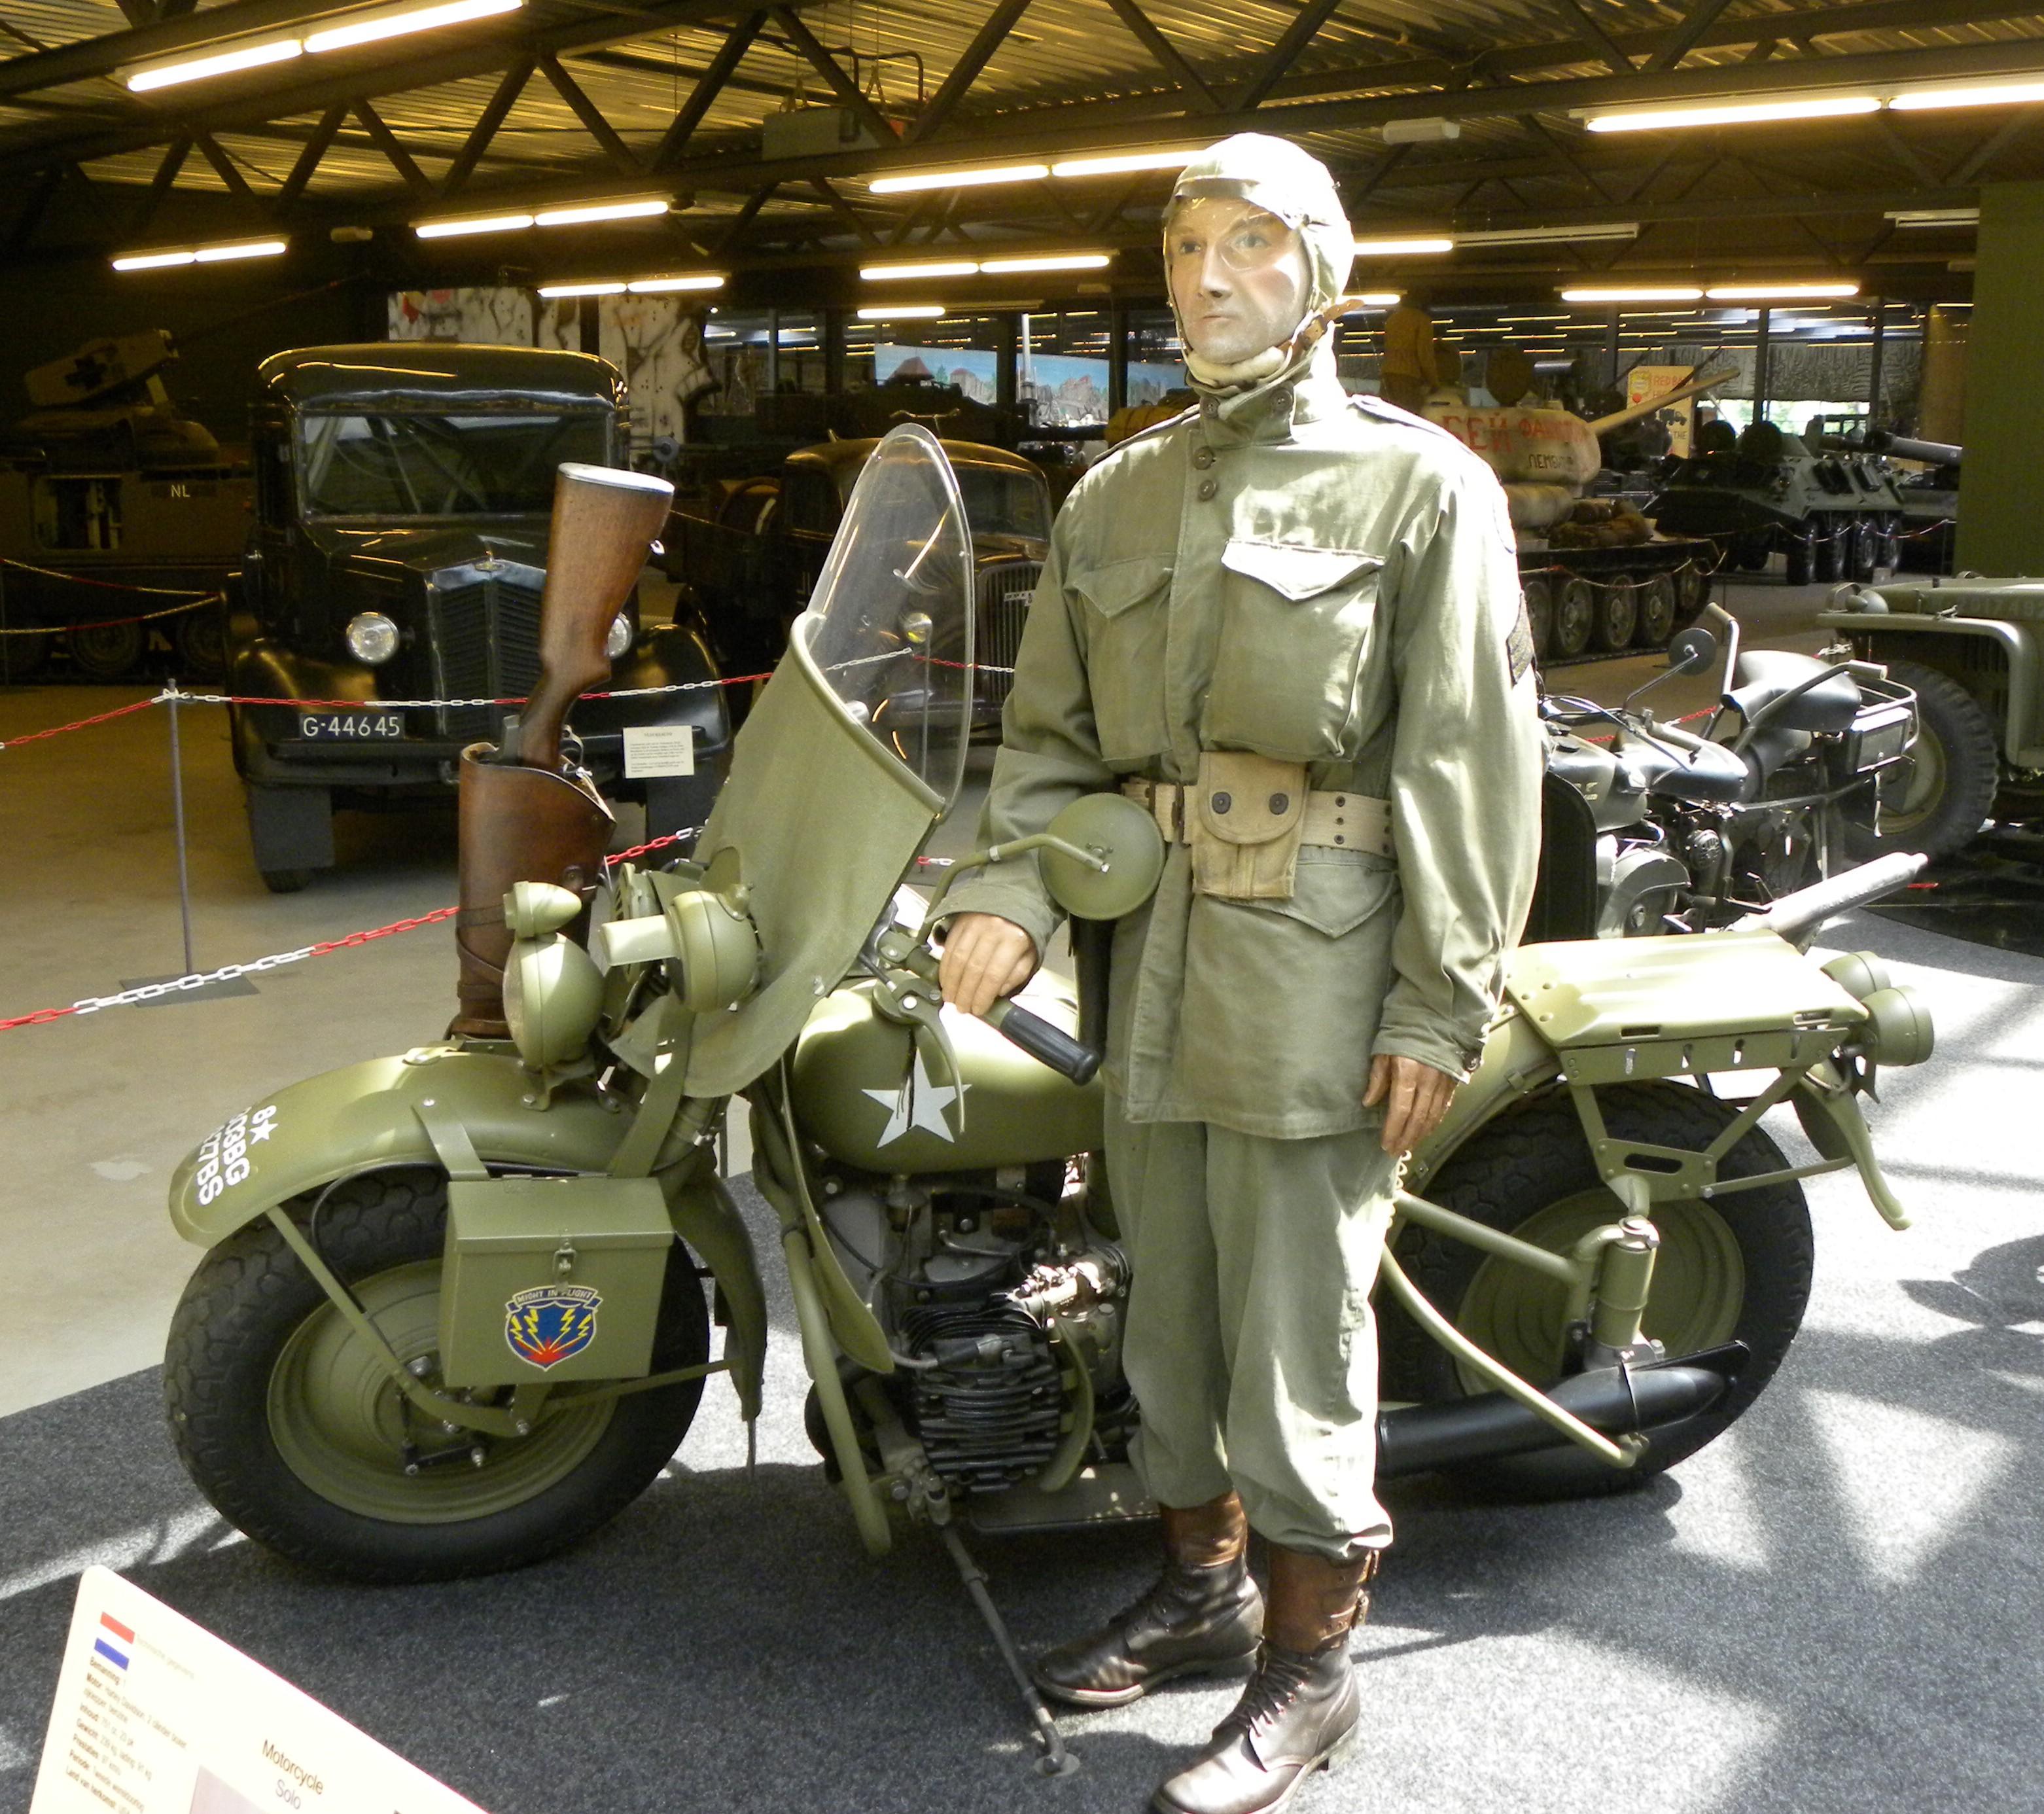 File:Harley Davidson XA from Wo-II.jpg - Wikimedia Commons